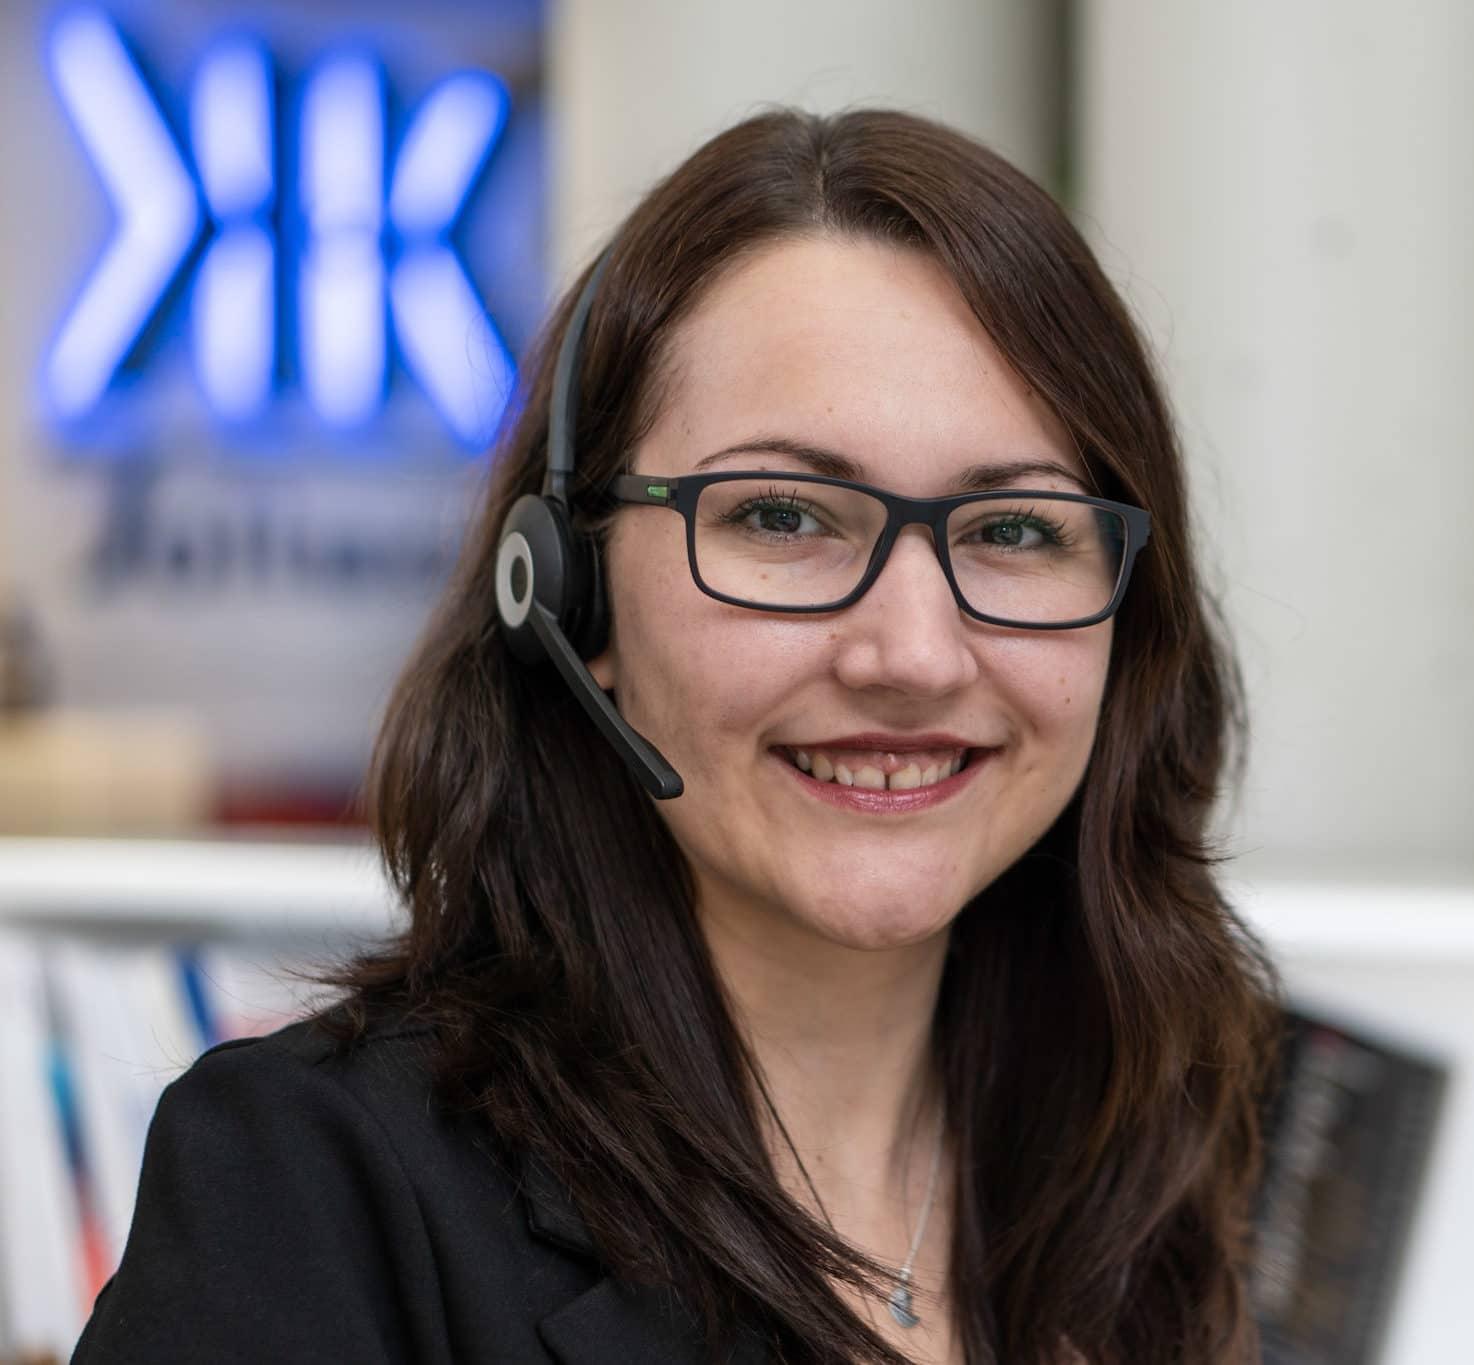 Vertriebsleiterin der K&K Software AG Laura Köpl